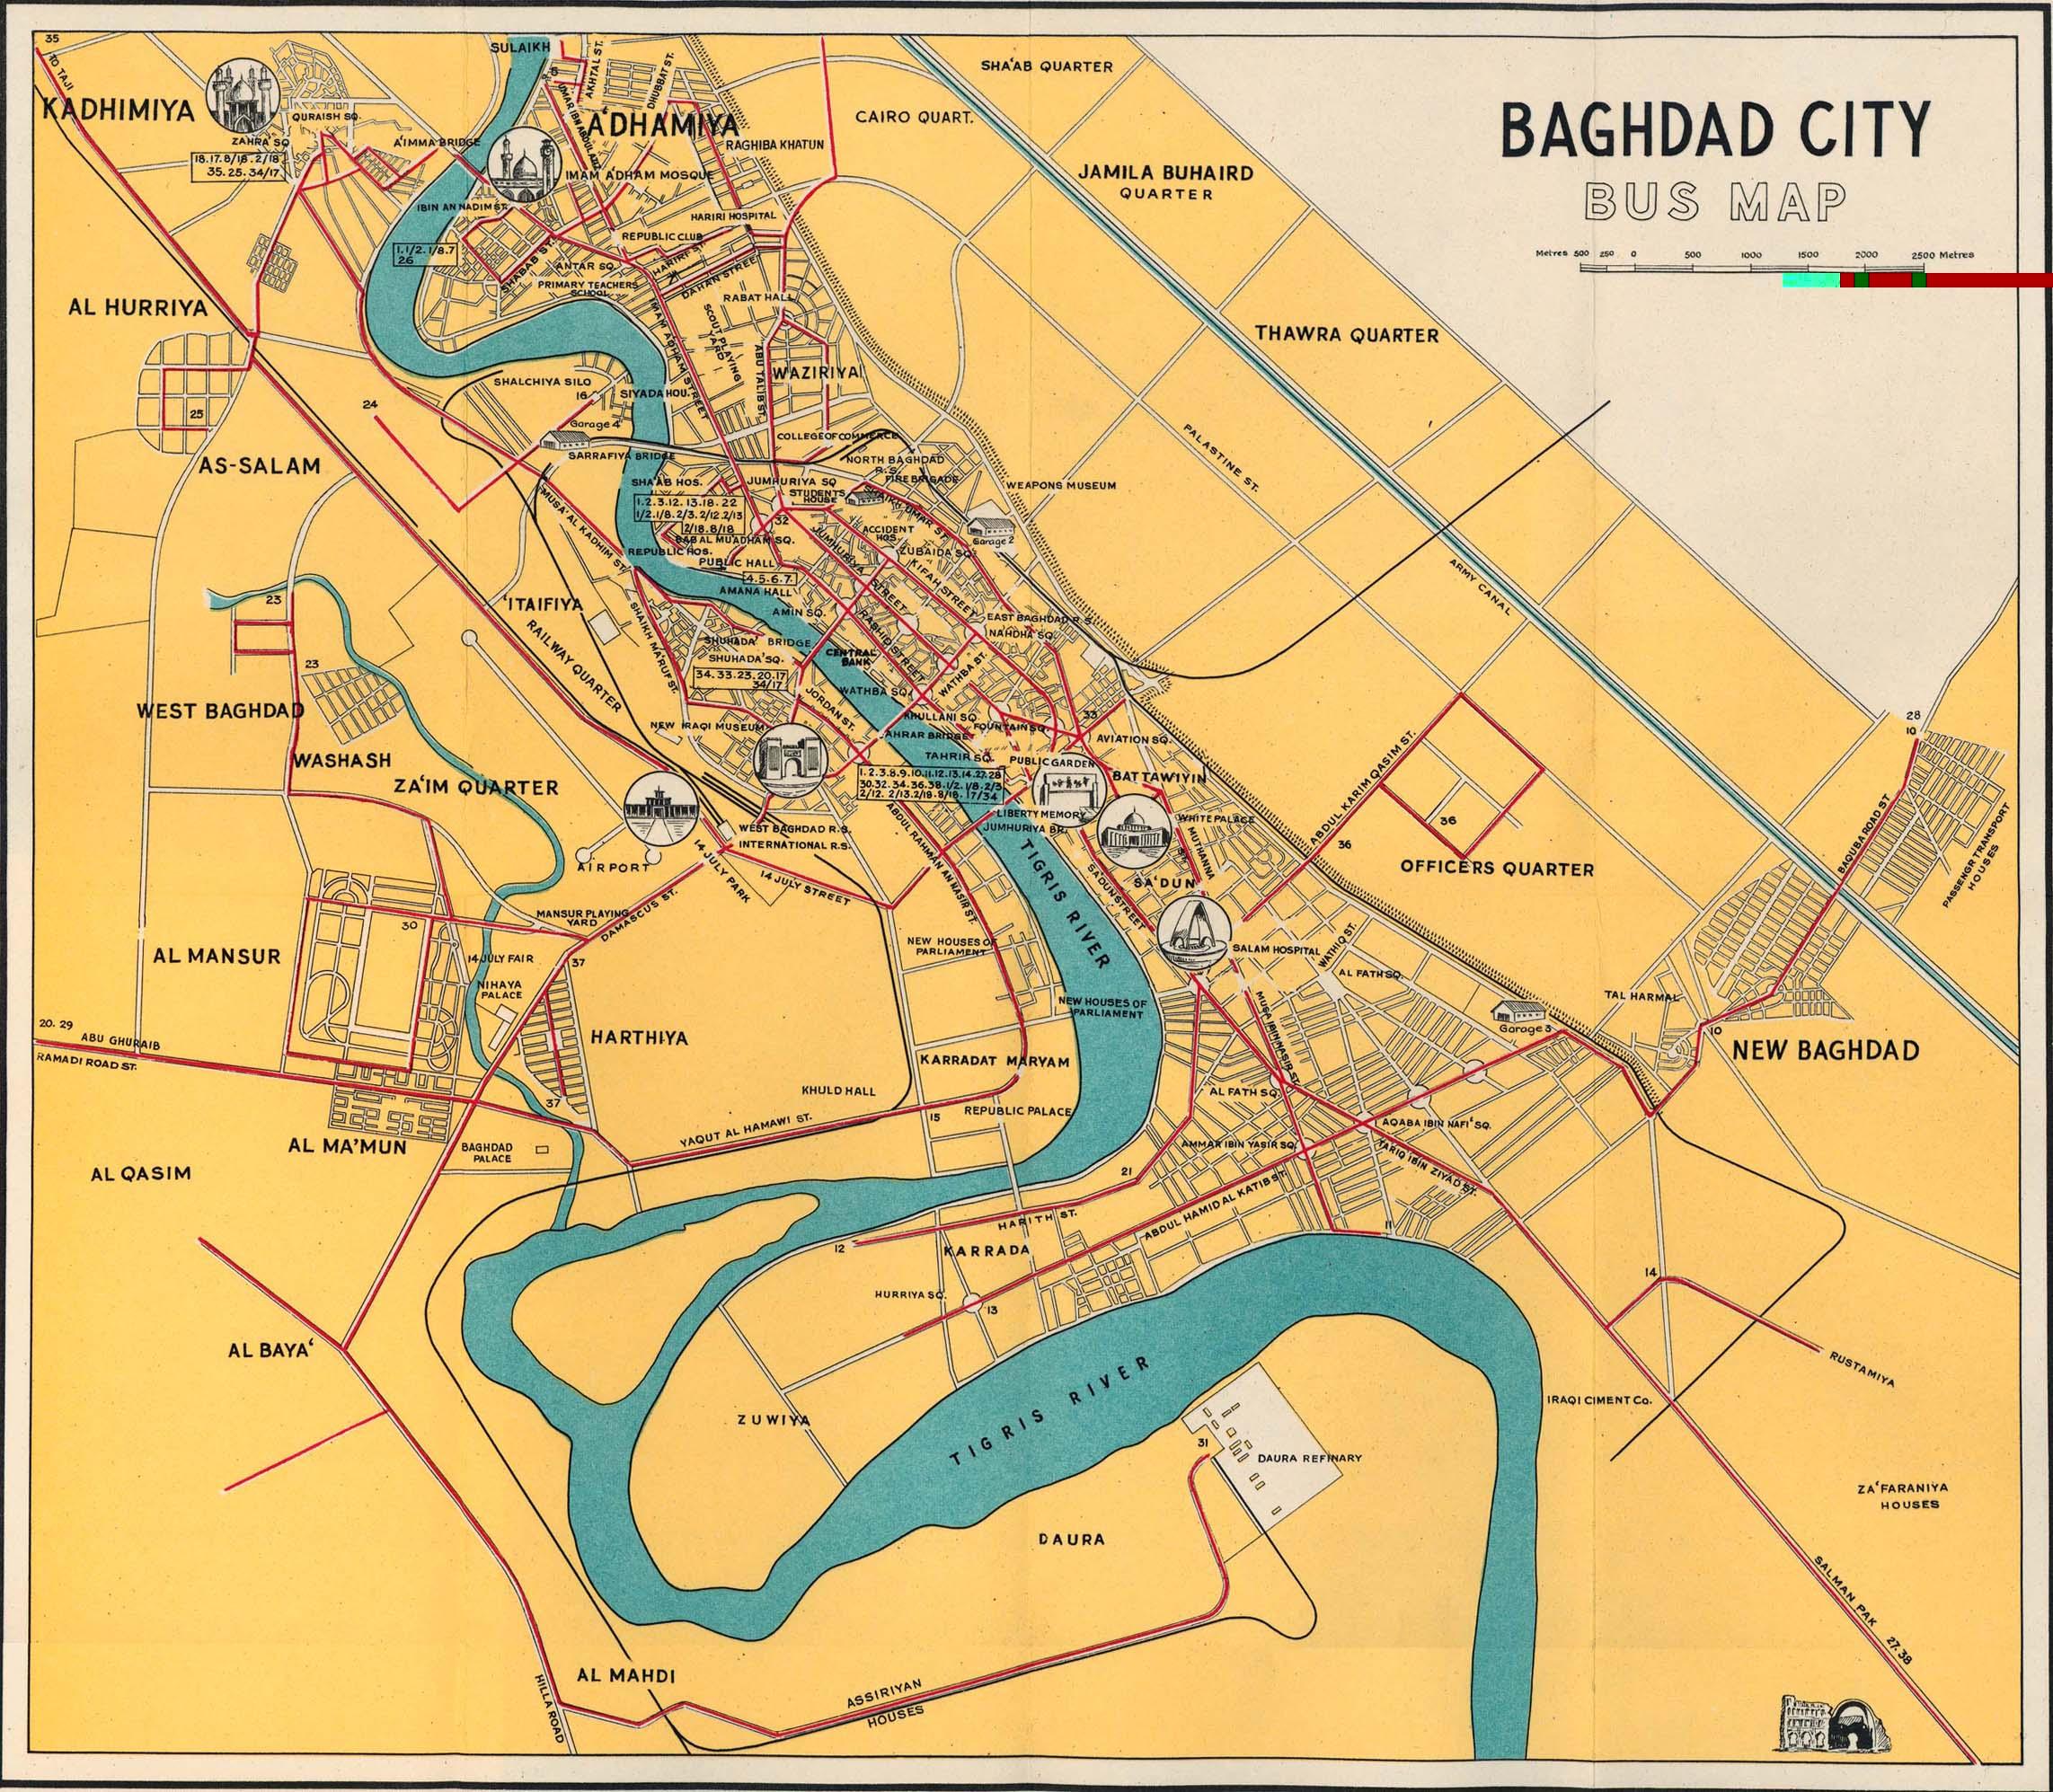 Mapa de autobuses de Bagdad 1961